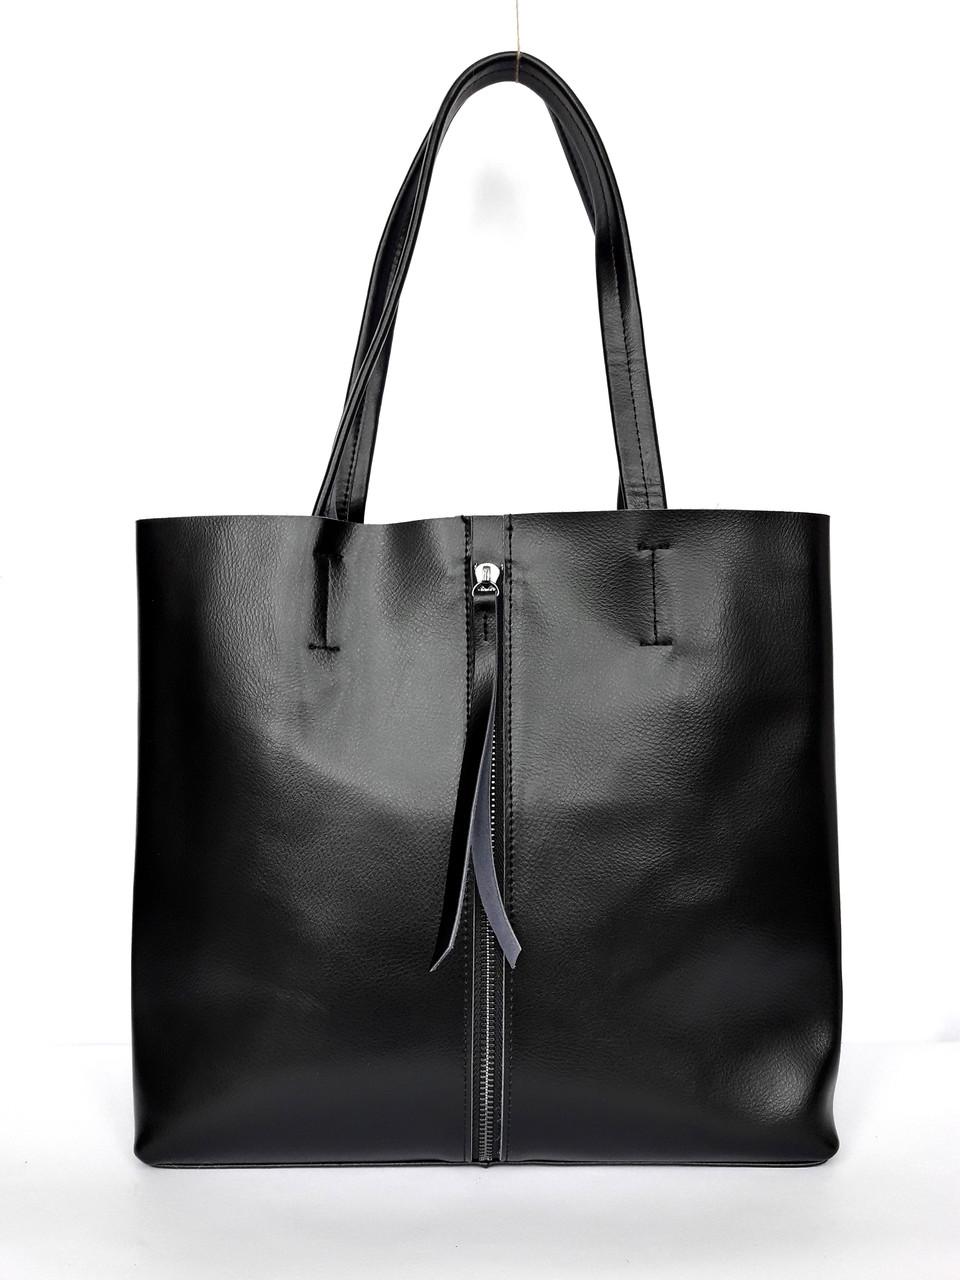 d33edaec16e7 Женская кожаная сумка